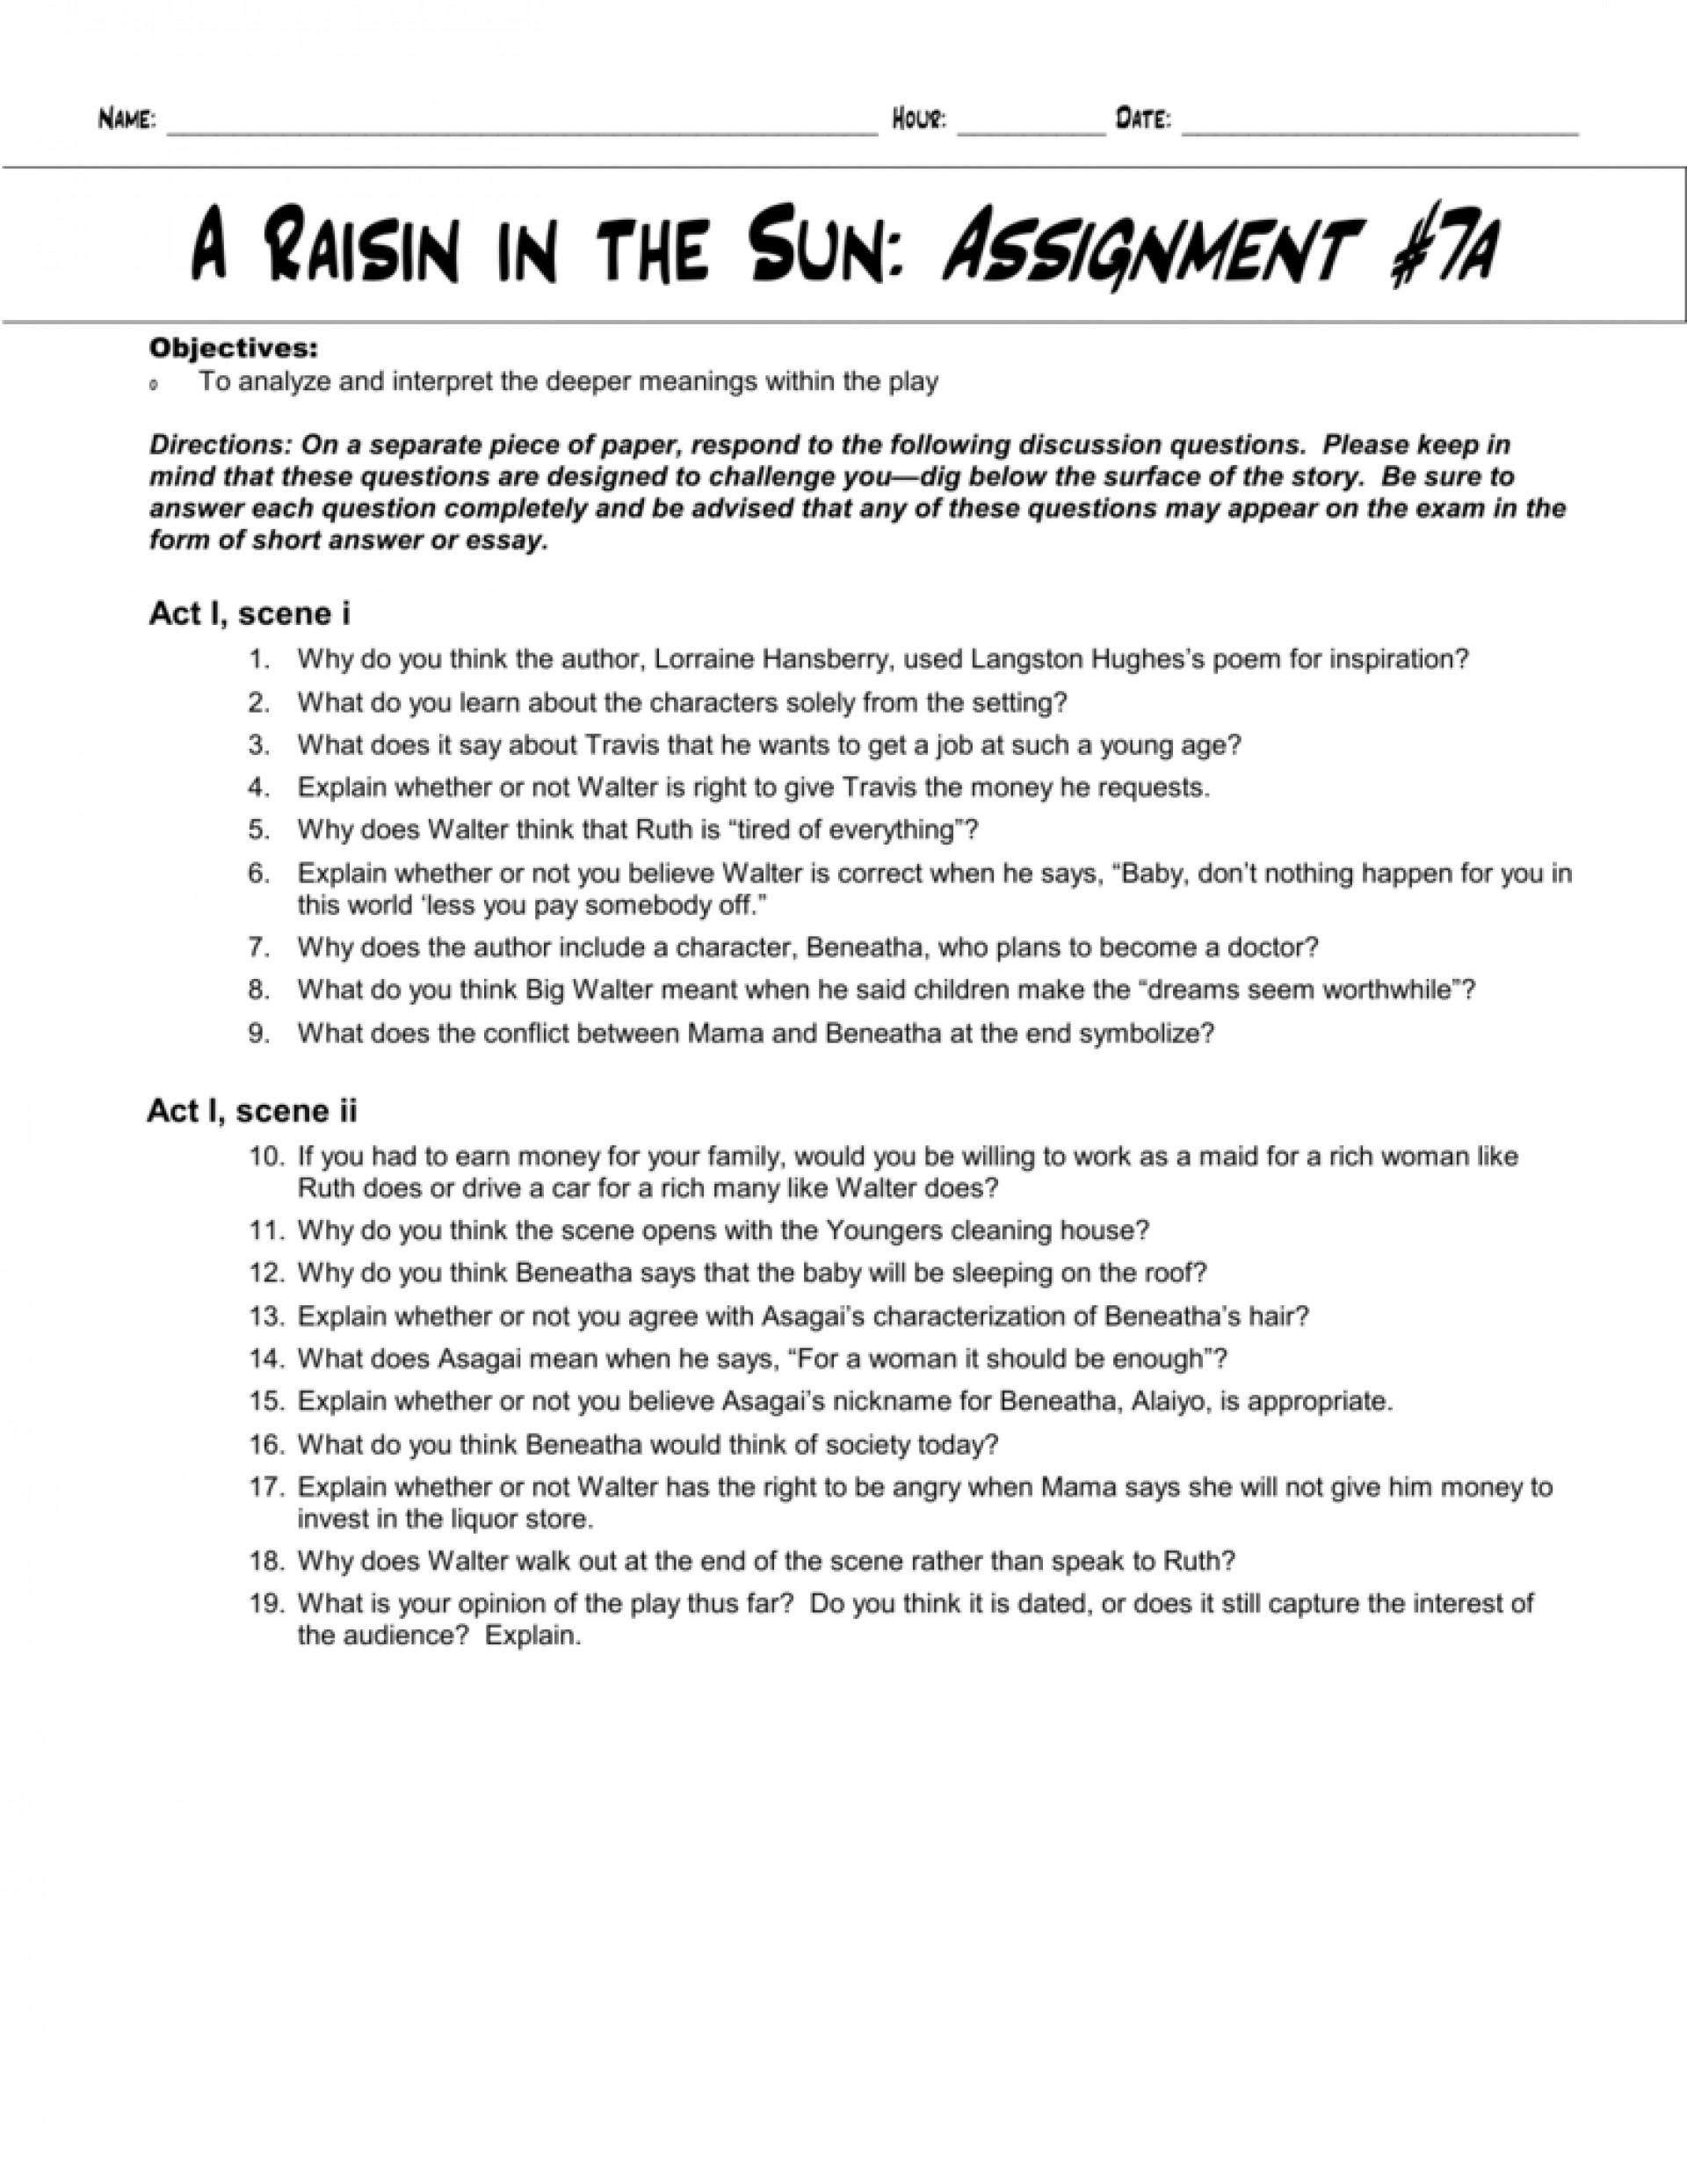 003 Raisin In The Sun Themes Essay 008718600 1 Beautiful A Theme Analysis 1920